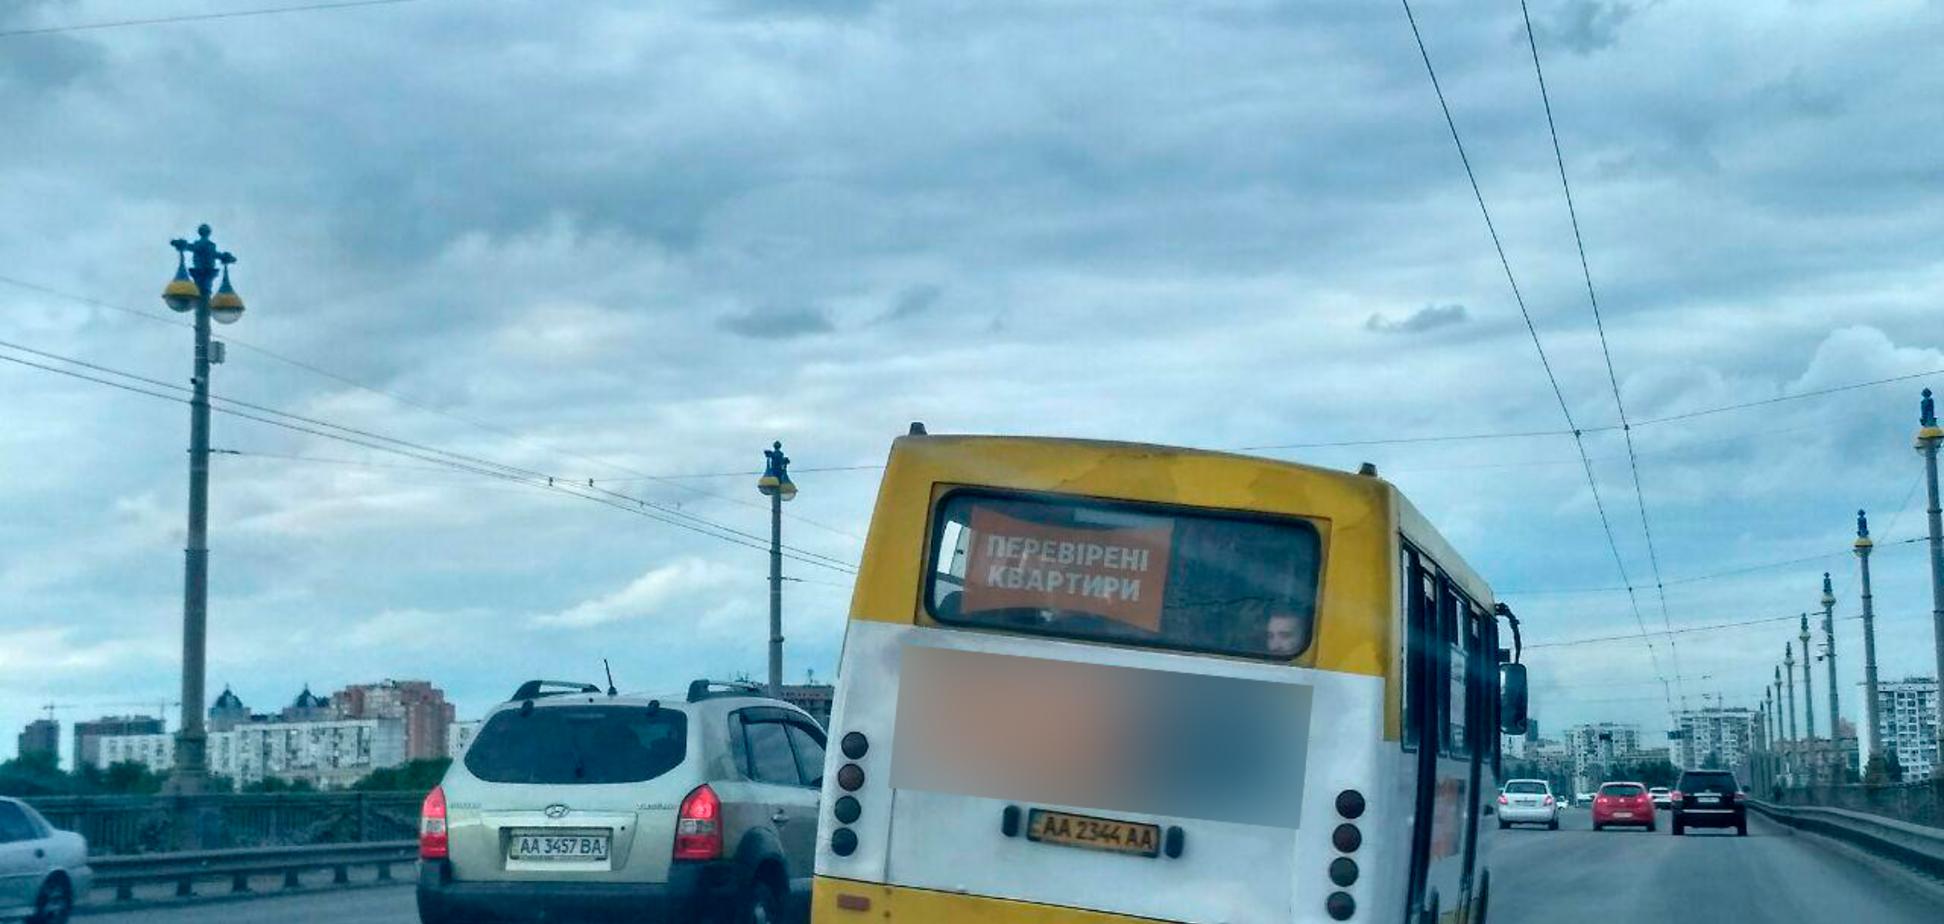 транспорт киев